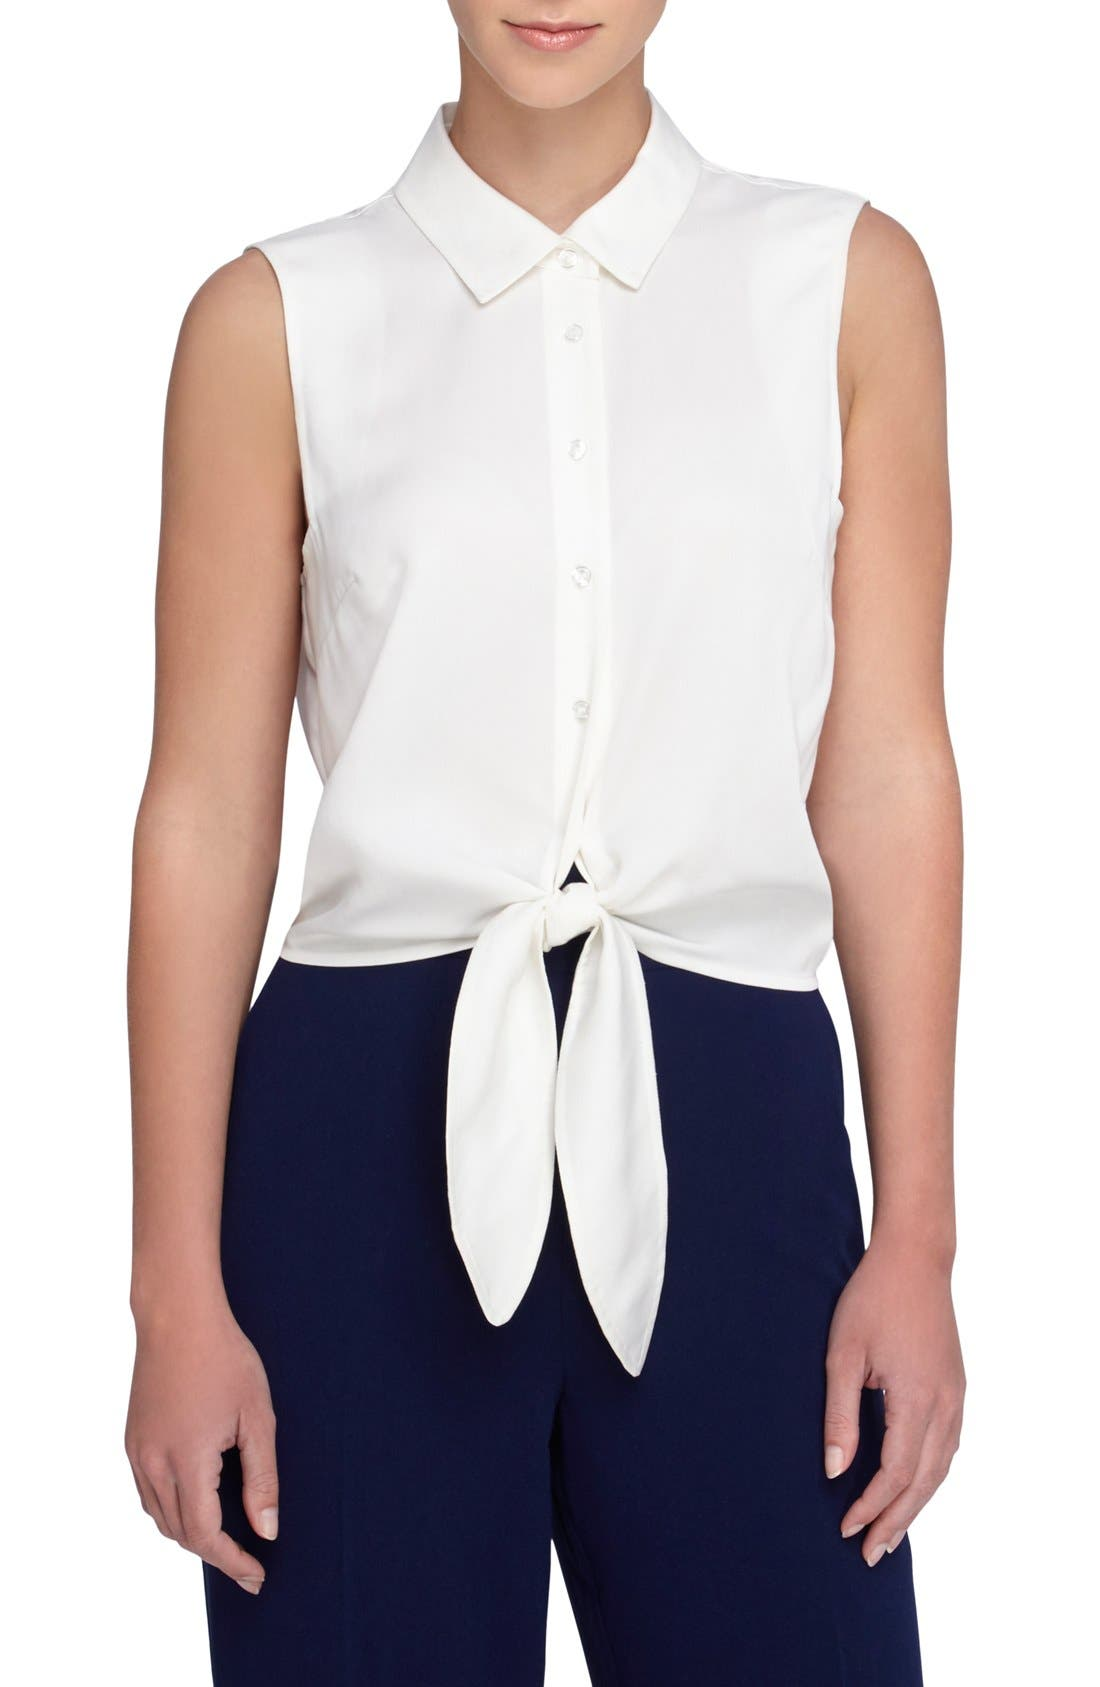 Main Image - Catherine Catherine Malandrino 'Colby' Sleeveless Tie Waist Blouse